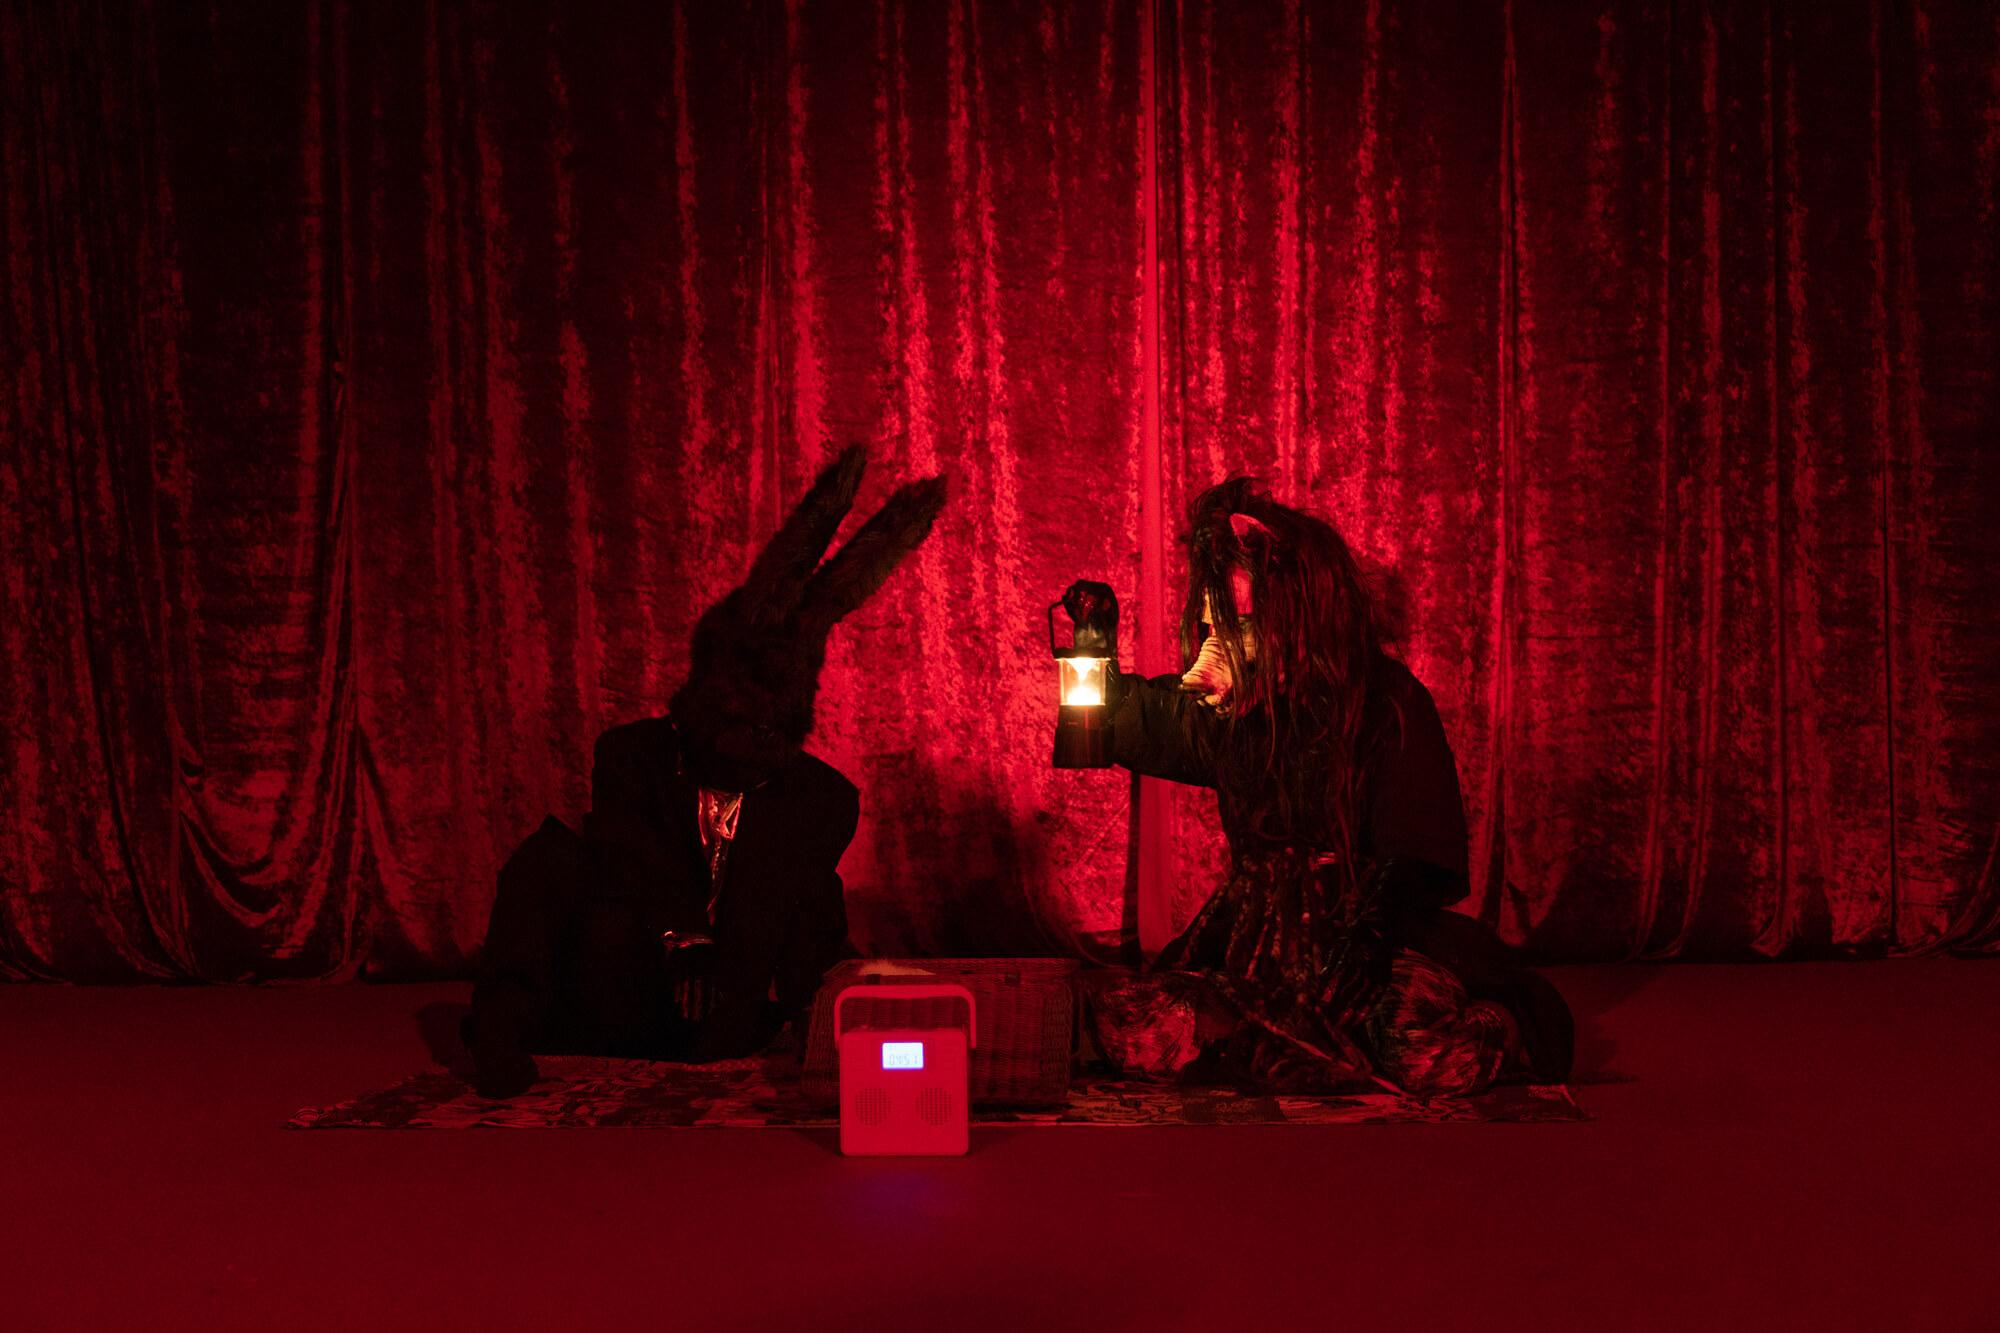 RED ROOM #5 開催風景 現代美術・アート Contemporary Art オフソサエティ offsociety